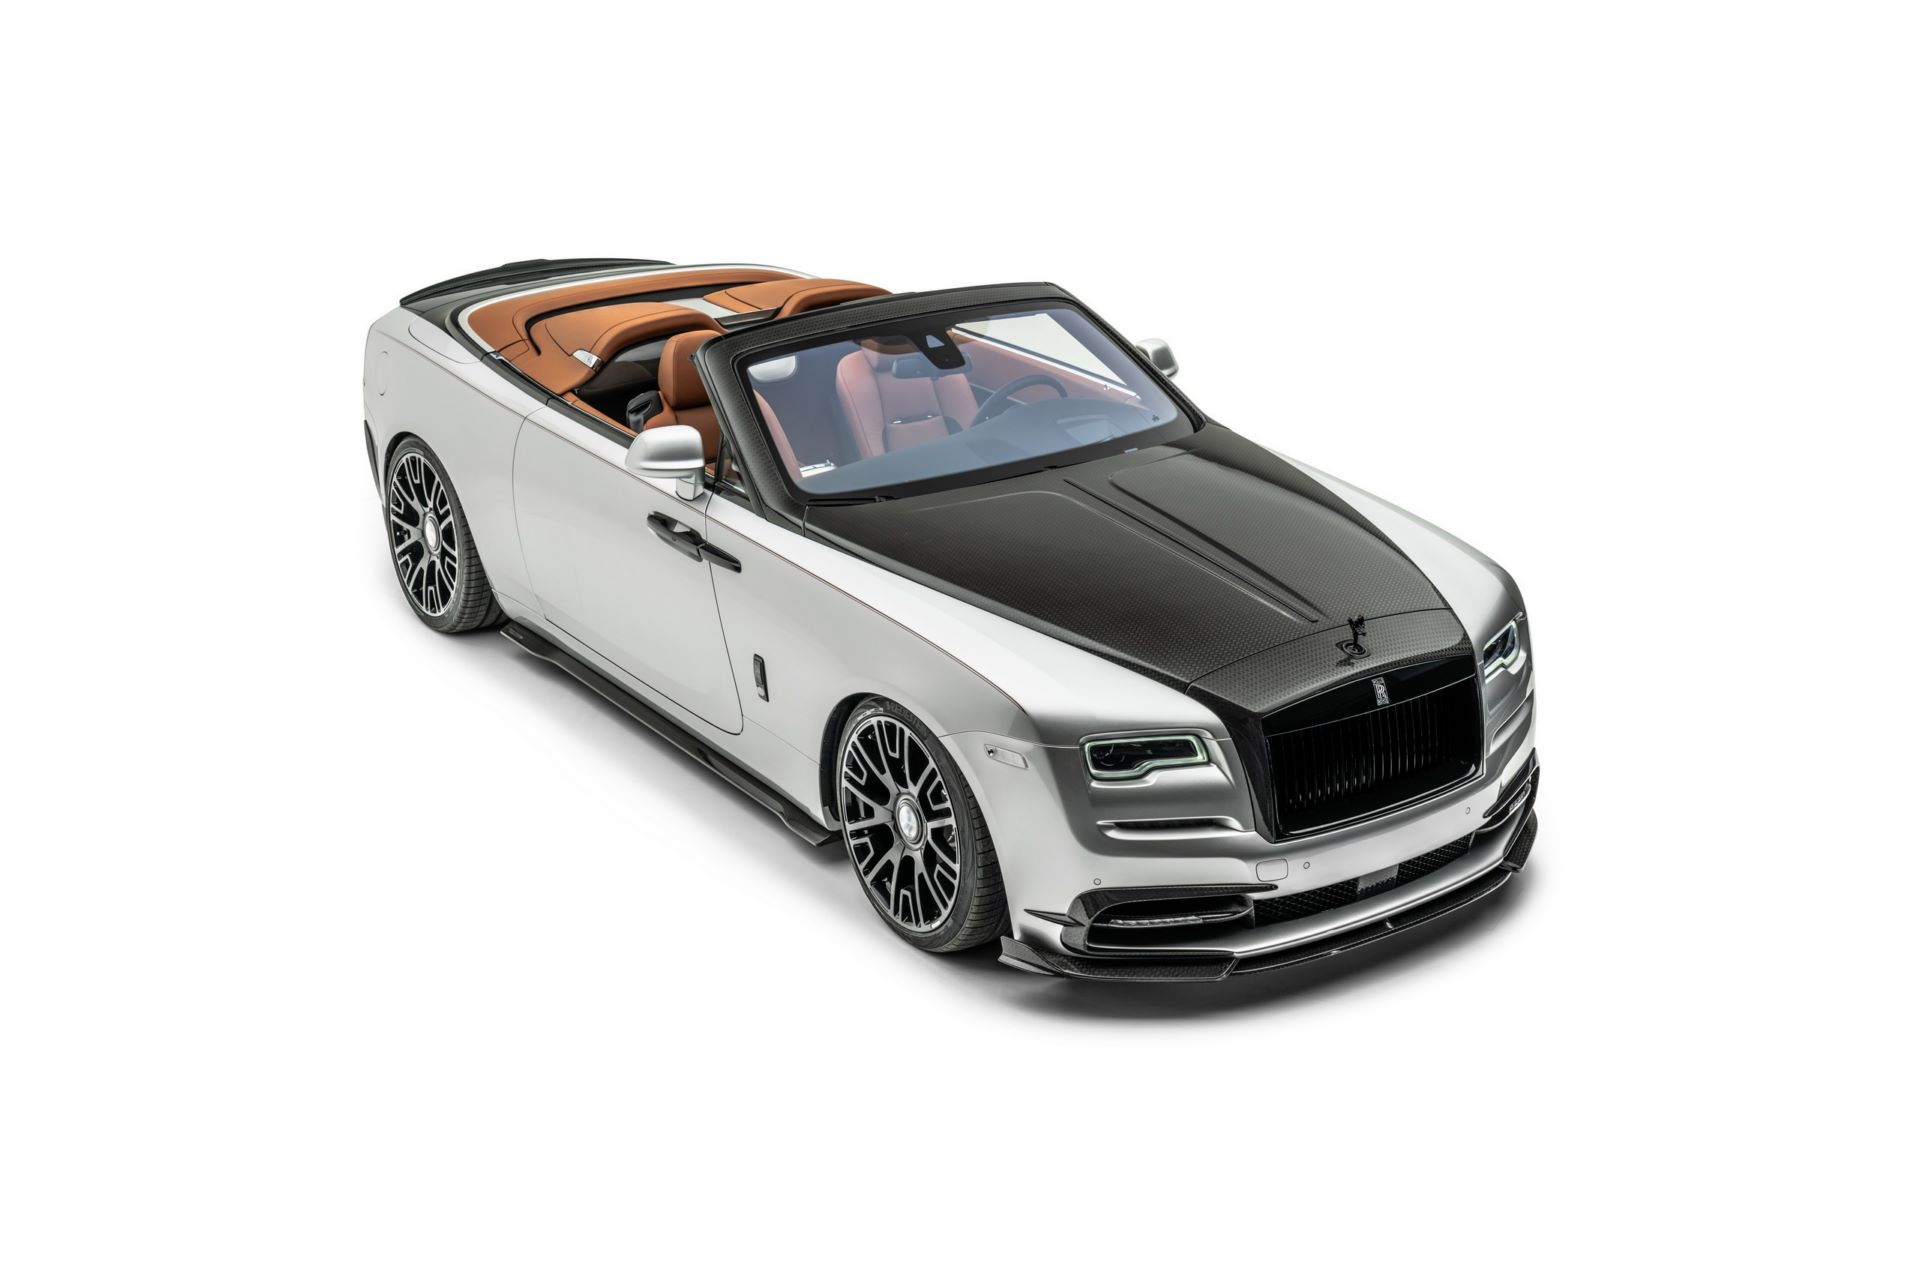 Rolls-Royce-Dawn-Silver-Bullet-Softkit-By-Mansory-10